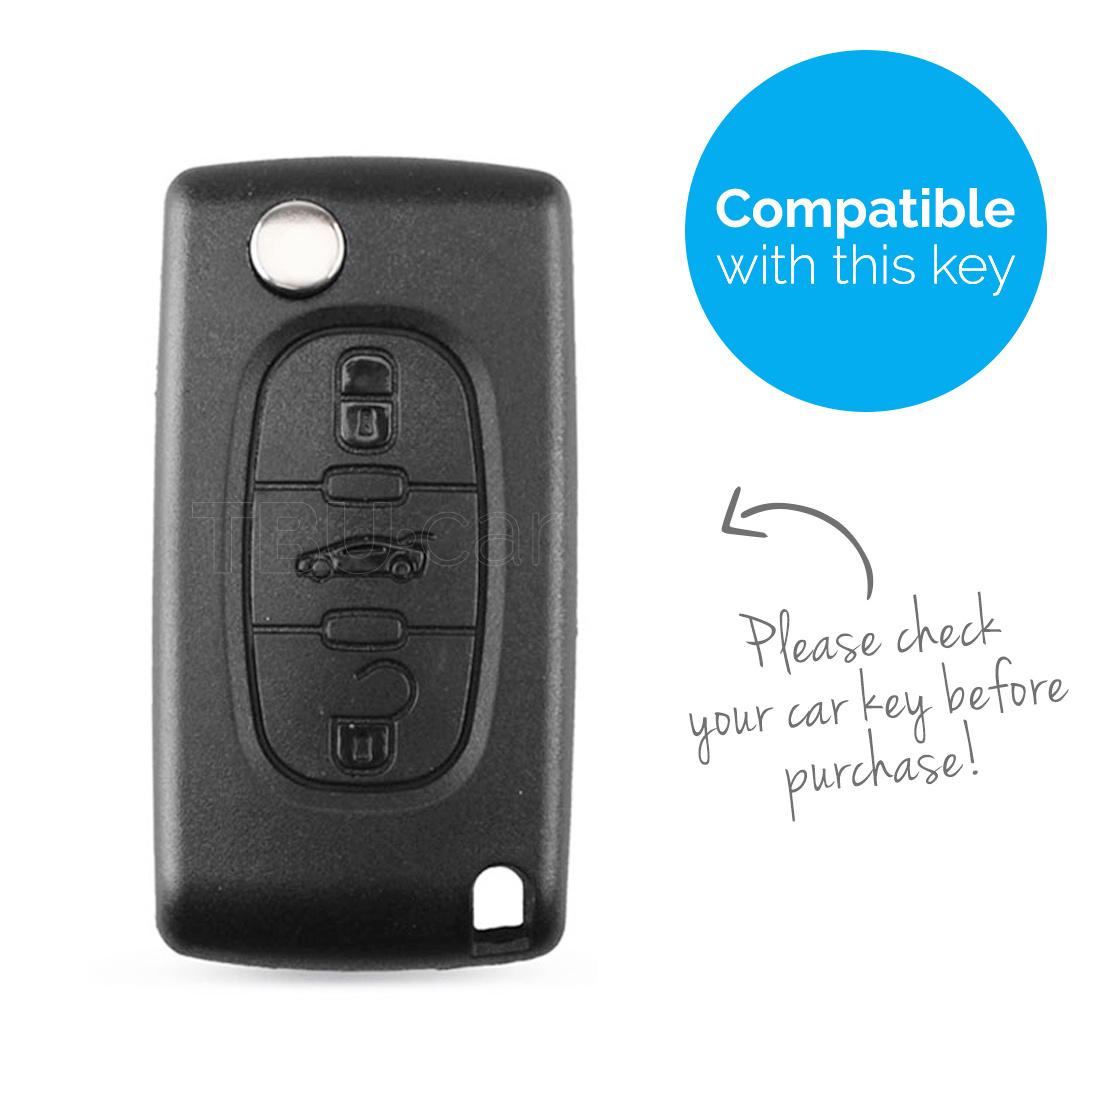 TBU car TBU car Sleutel cover compatibel met Fiat - Silicone sleutelhoesje - beschermhoesje autosleutel - Roze